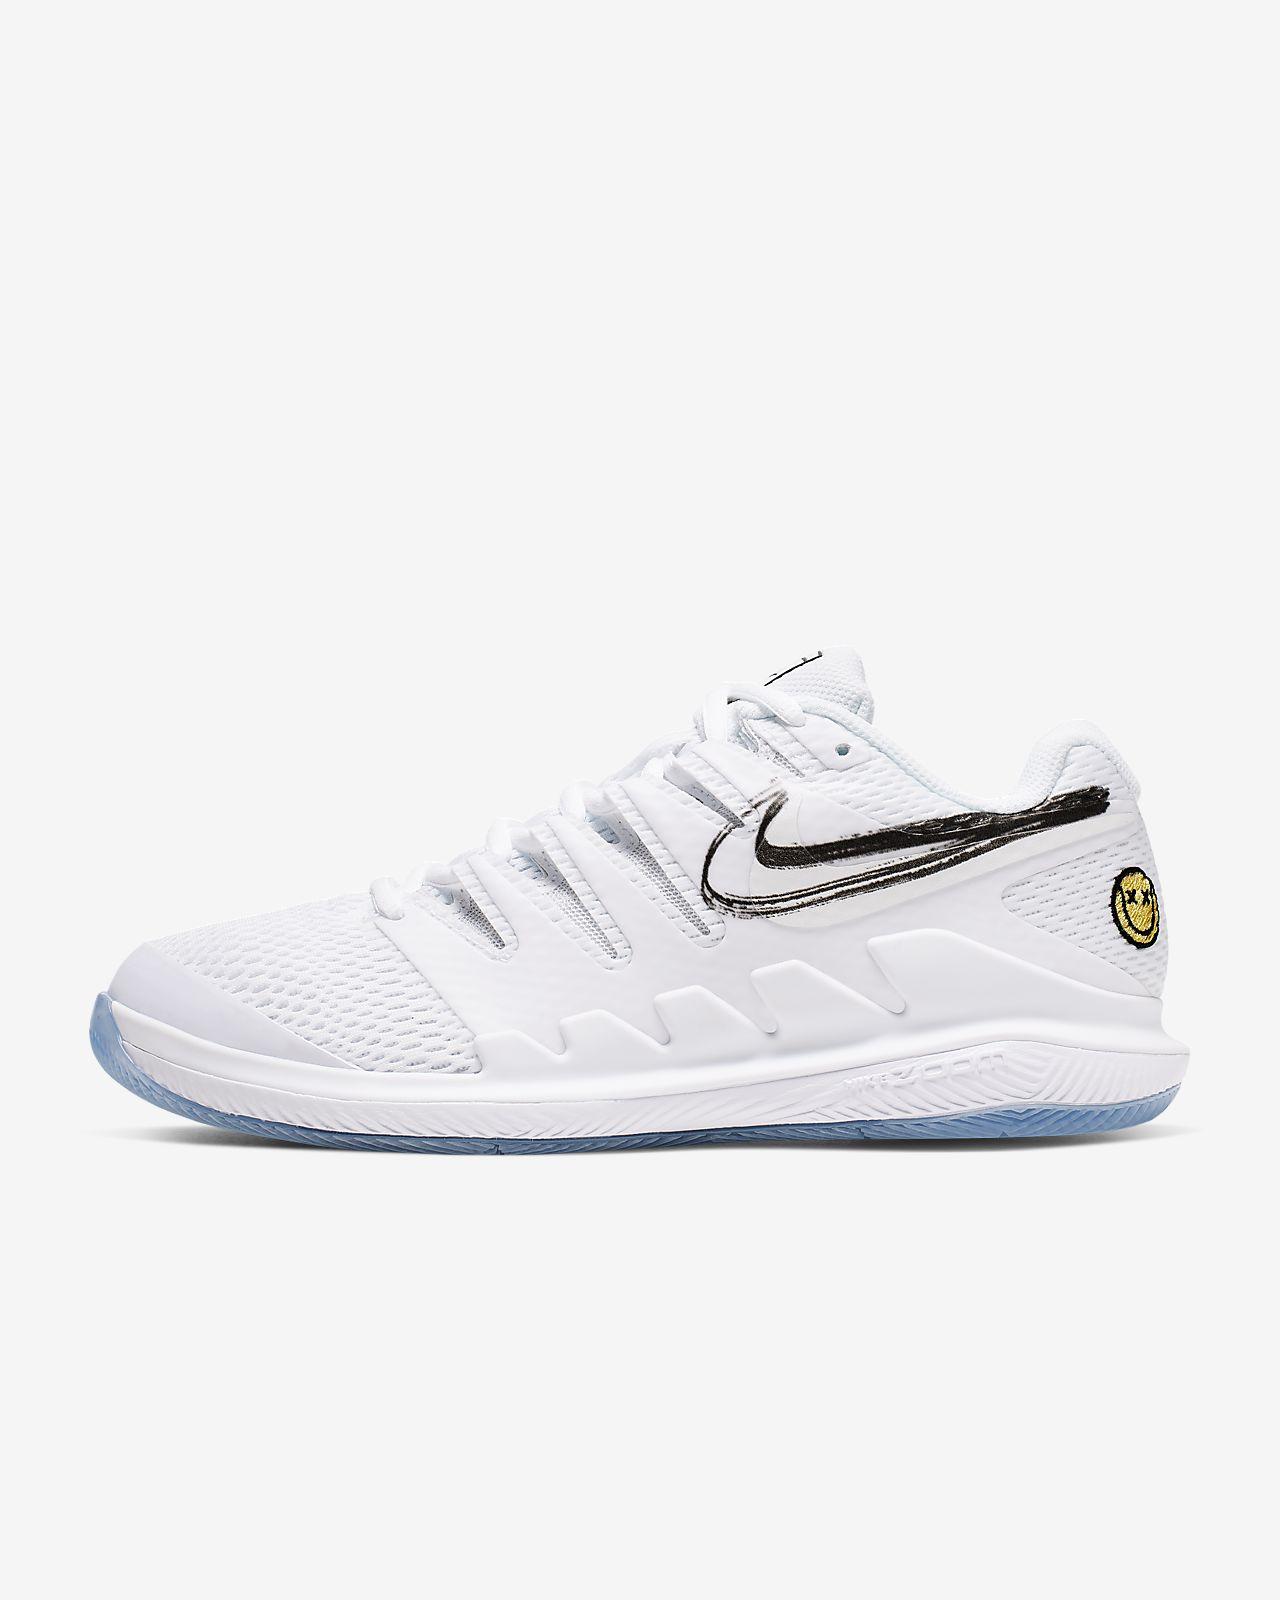 Nike Air Zoom Vapor Wmns Schoenen wit 38